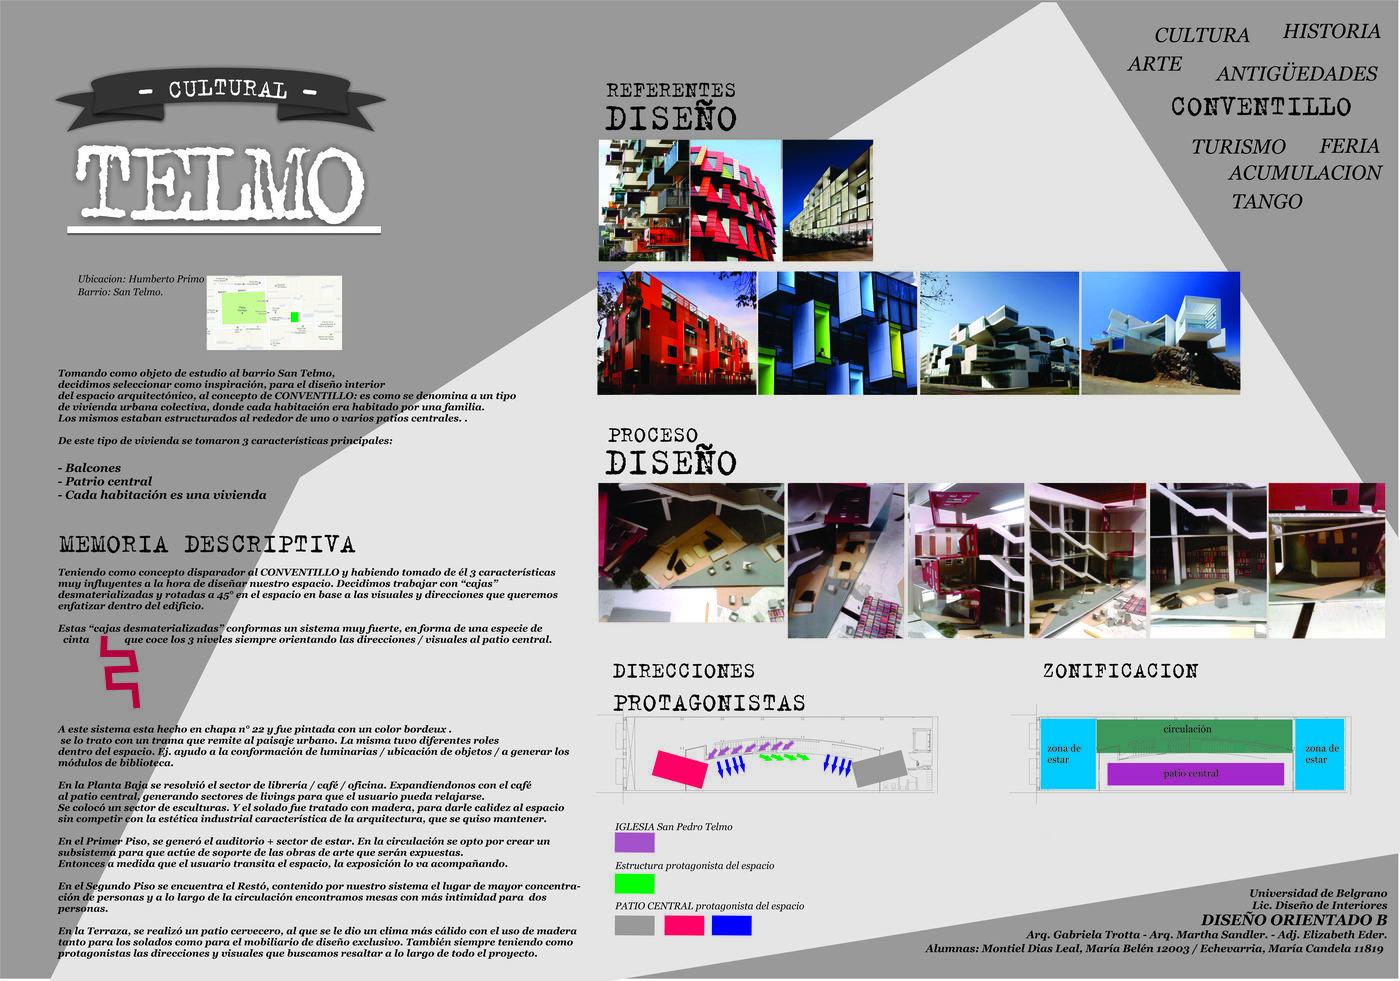 2012 Cultural Telmo By Maria Belen Montiel Dias Leal At